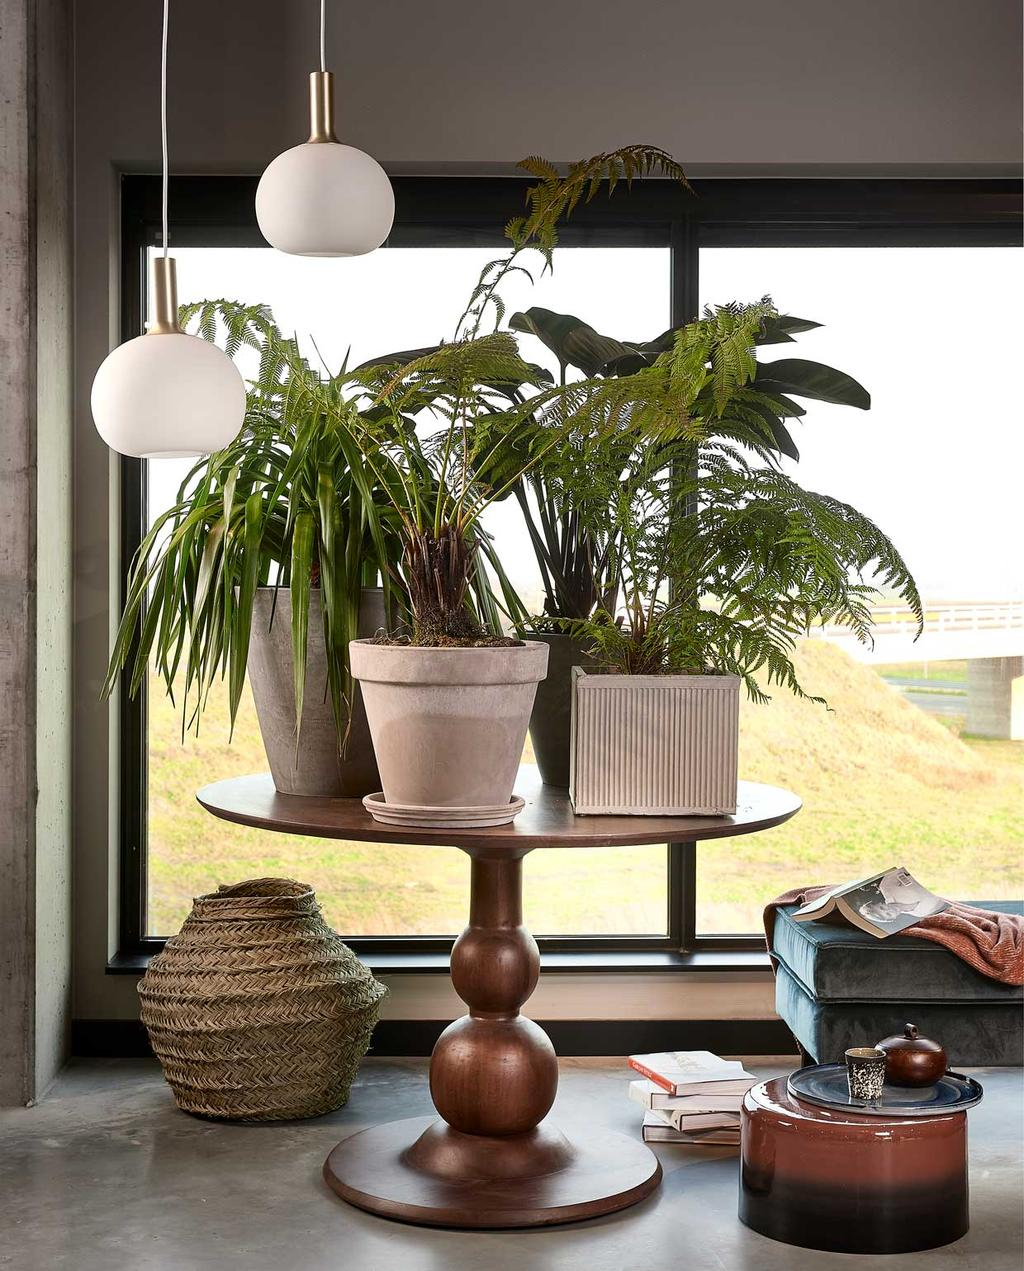 vtwonen 01-2021 | styling natuur in huis xl plantentafel